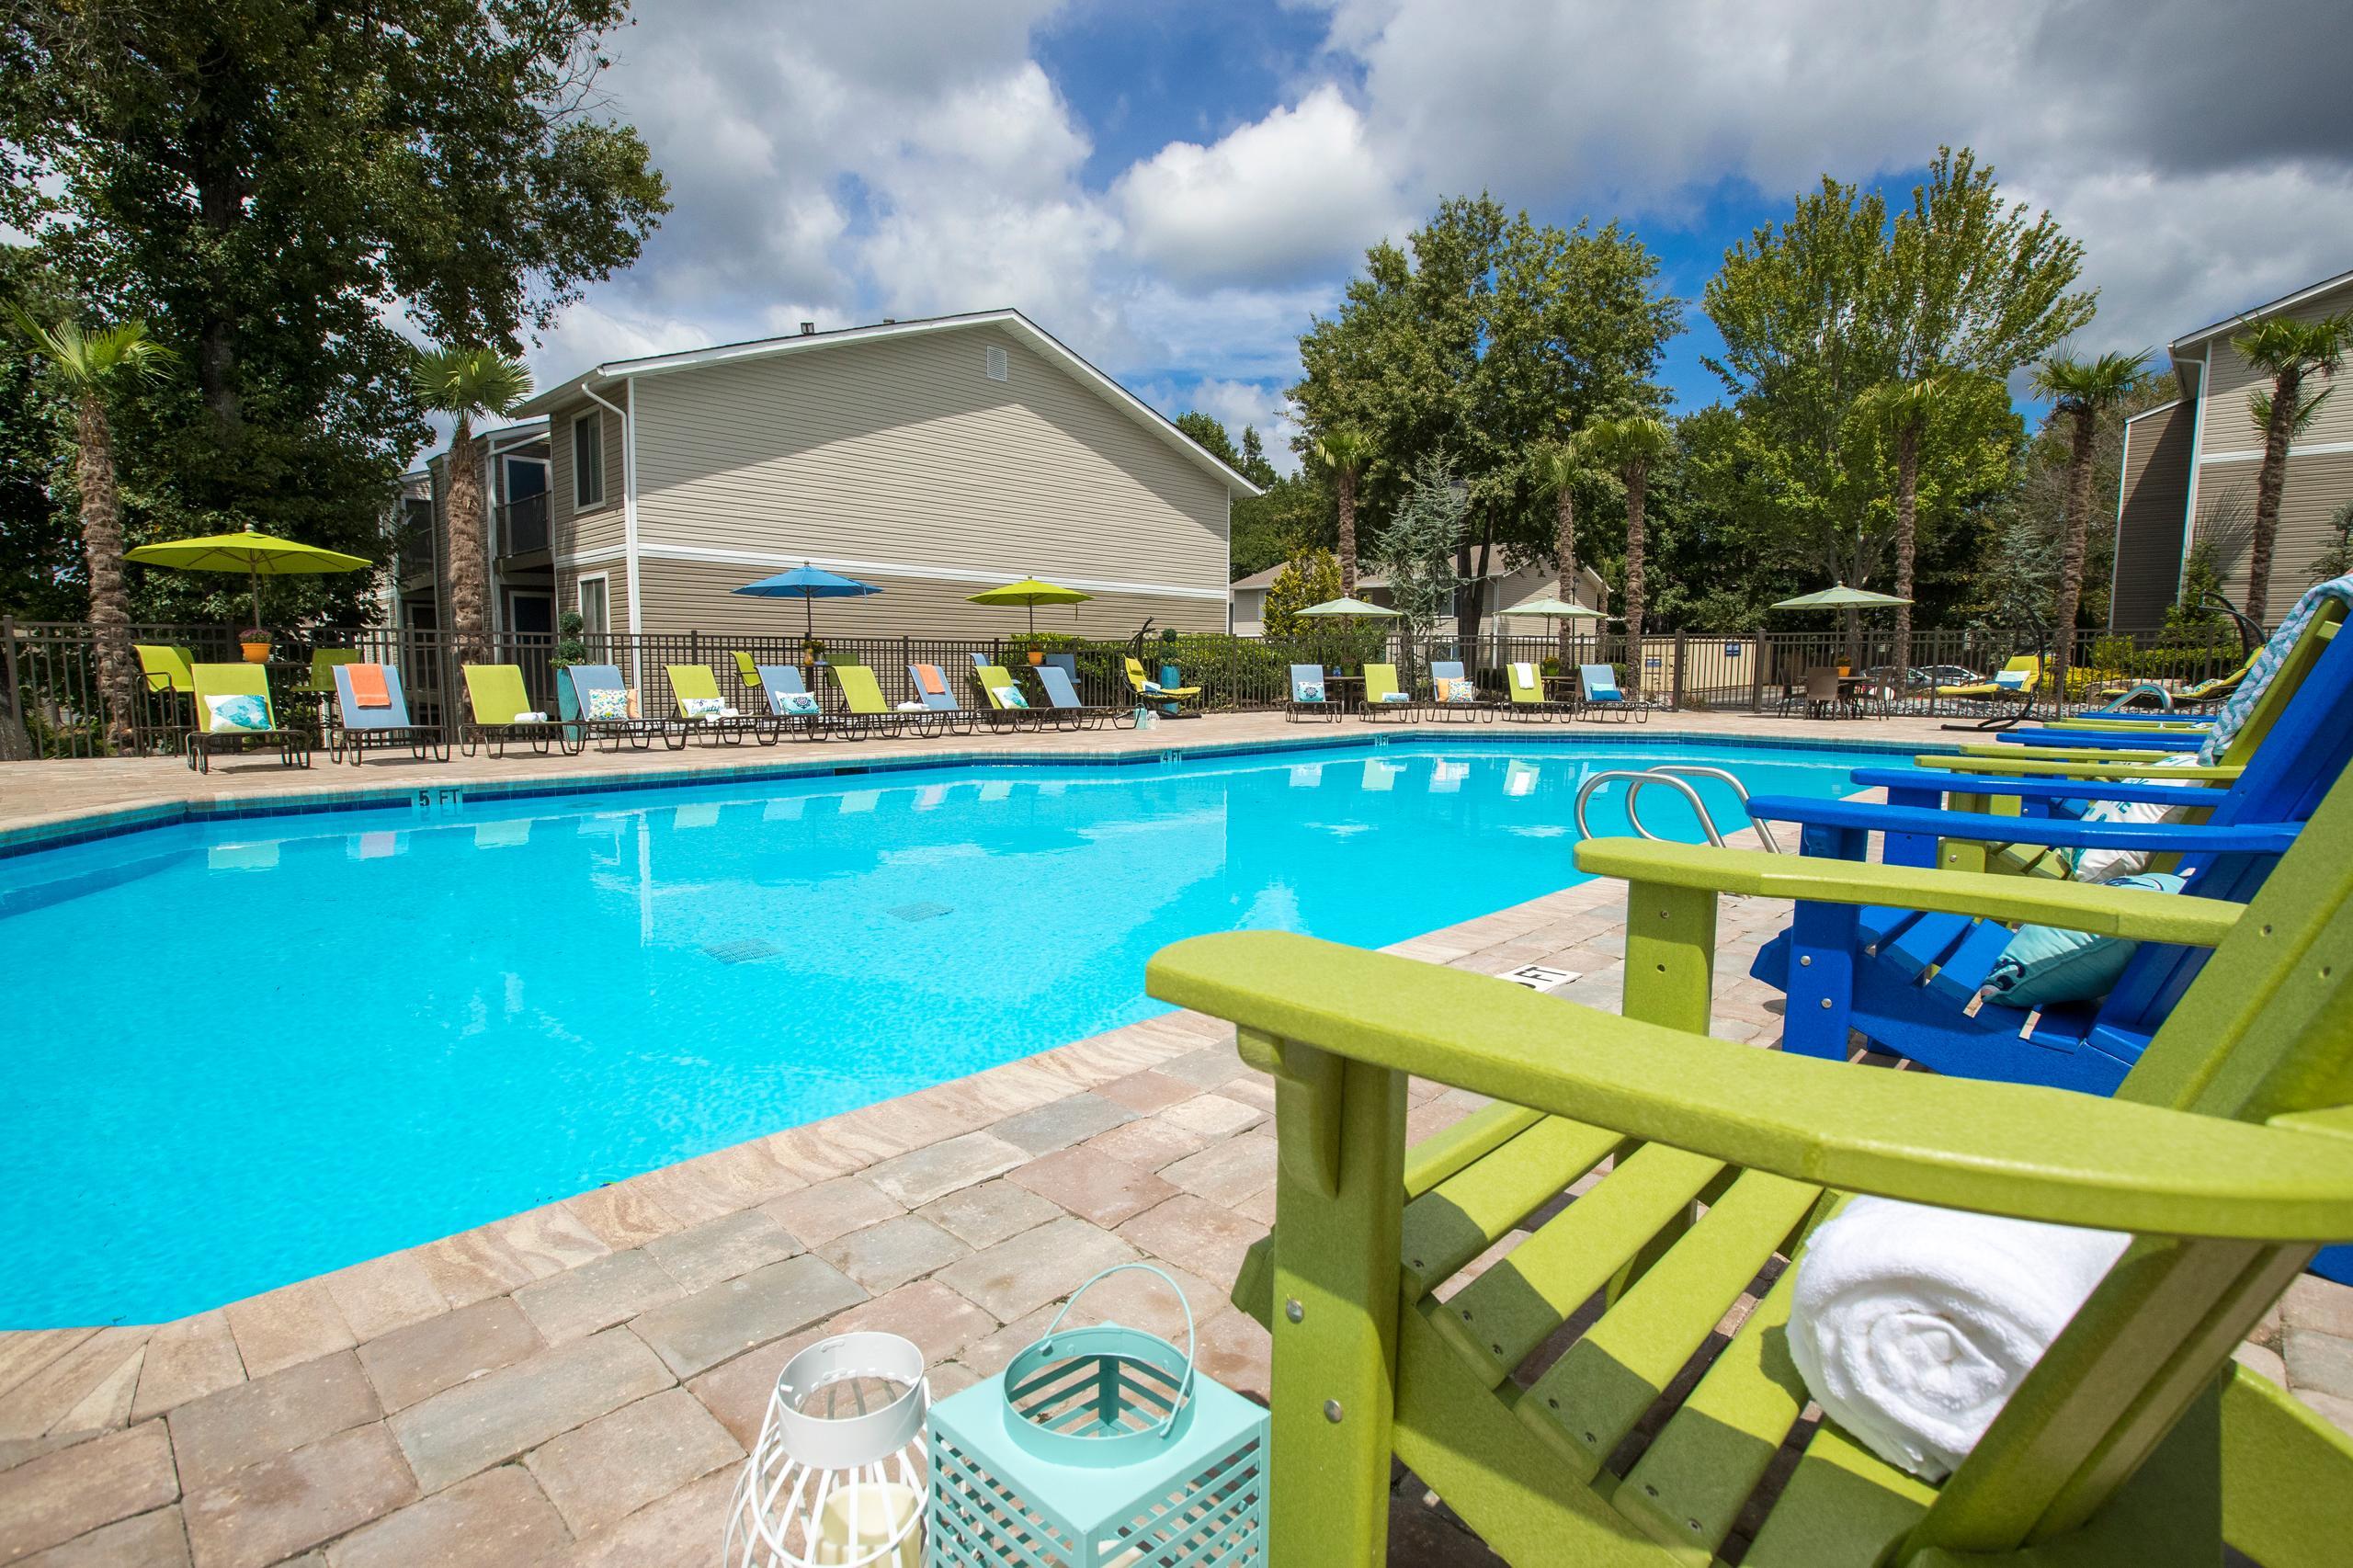 Norcross GA Apartments for Rent Aspen Square Management Apartments